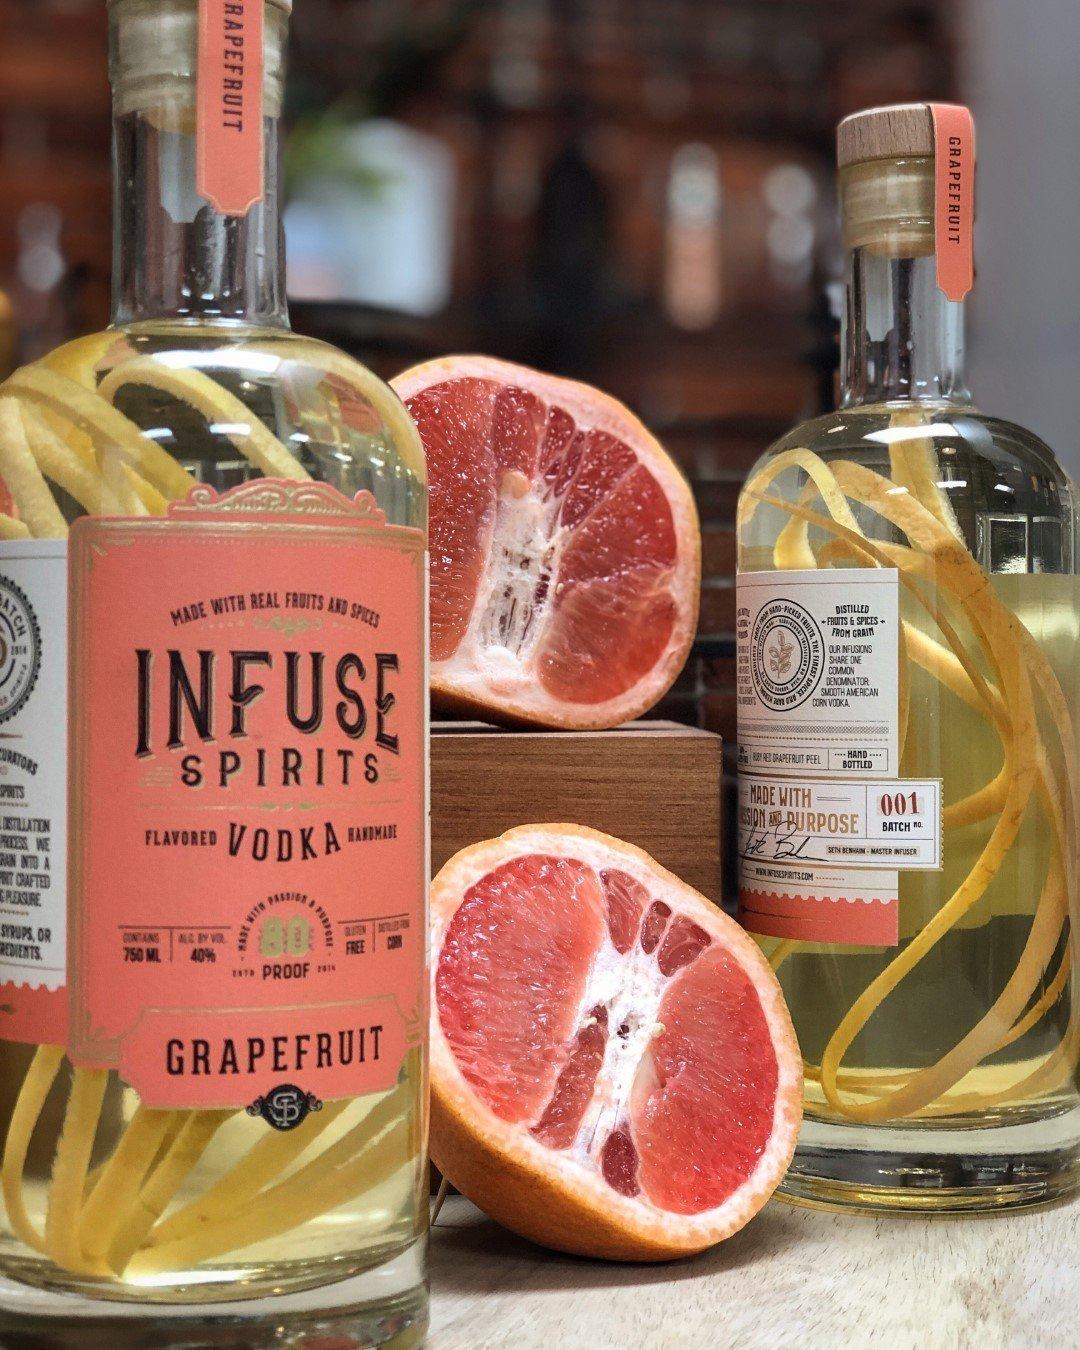 Infuse Spirits Grapefruit Vodka